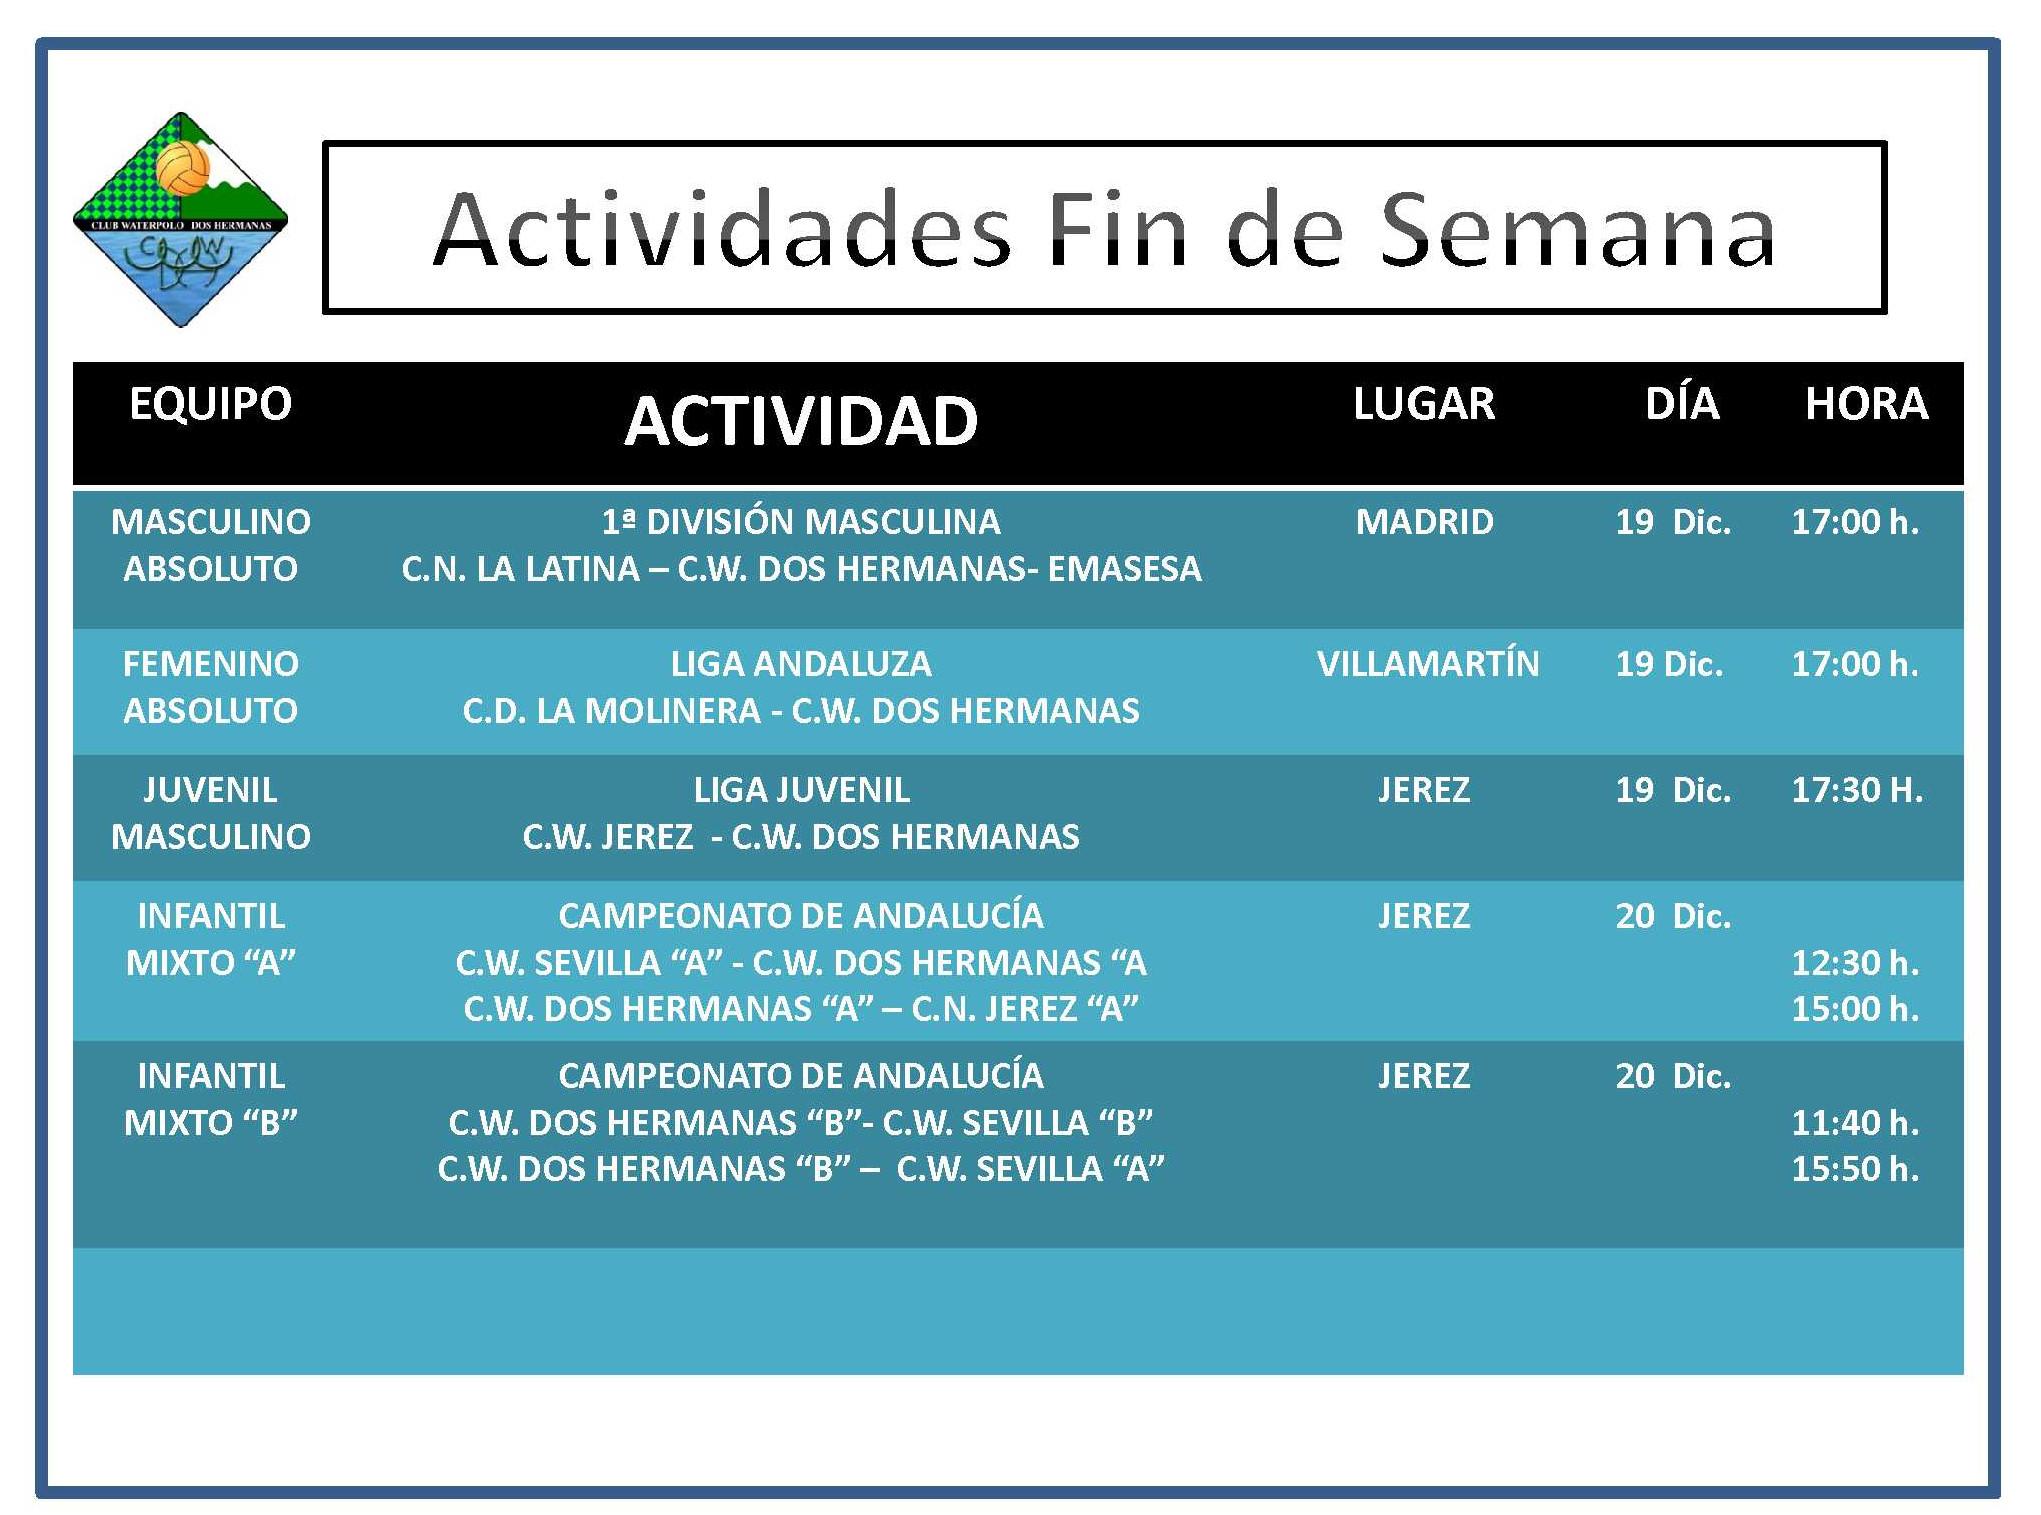 Agenda 19-20 Diciembre